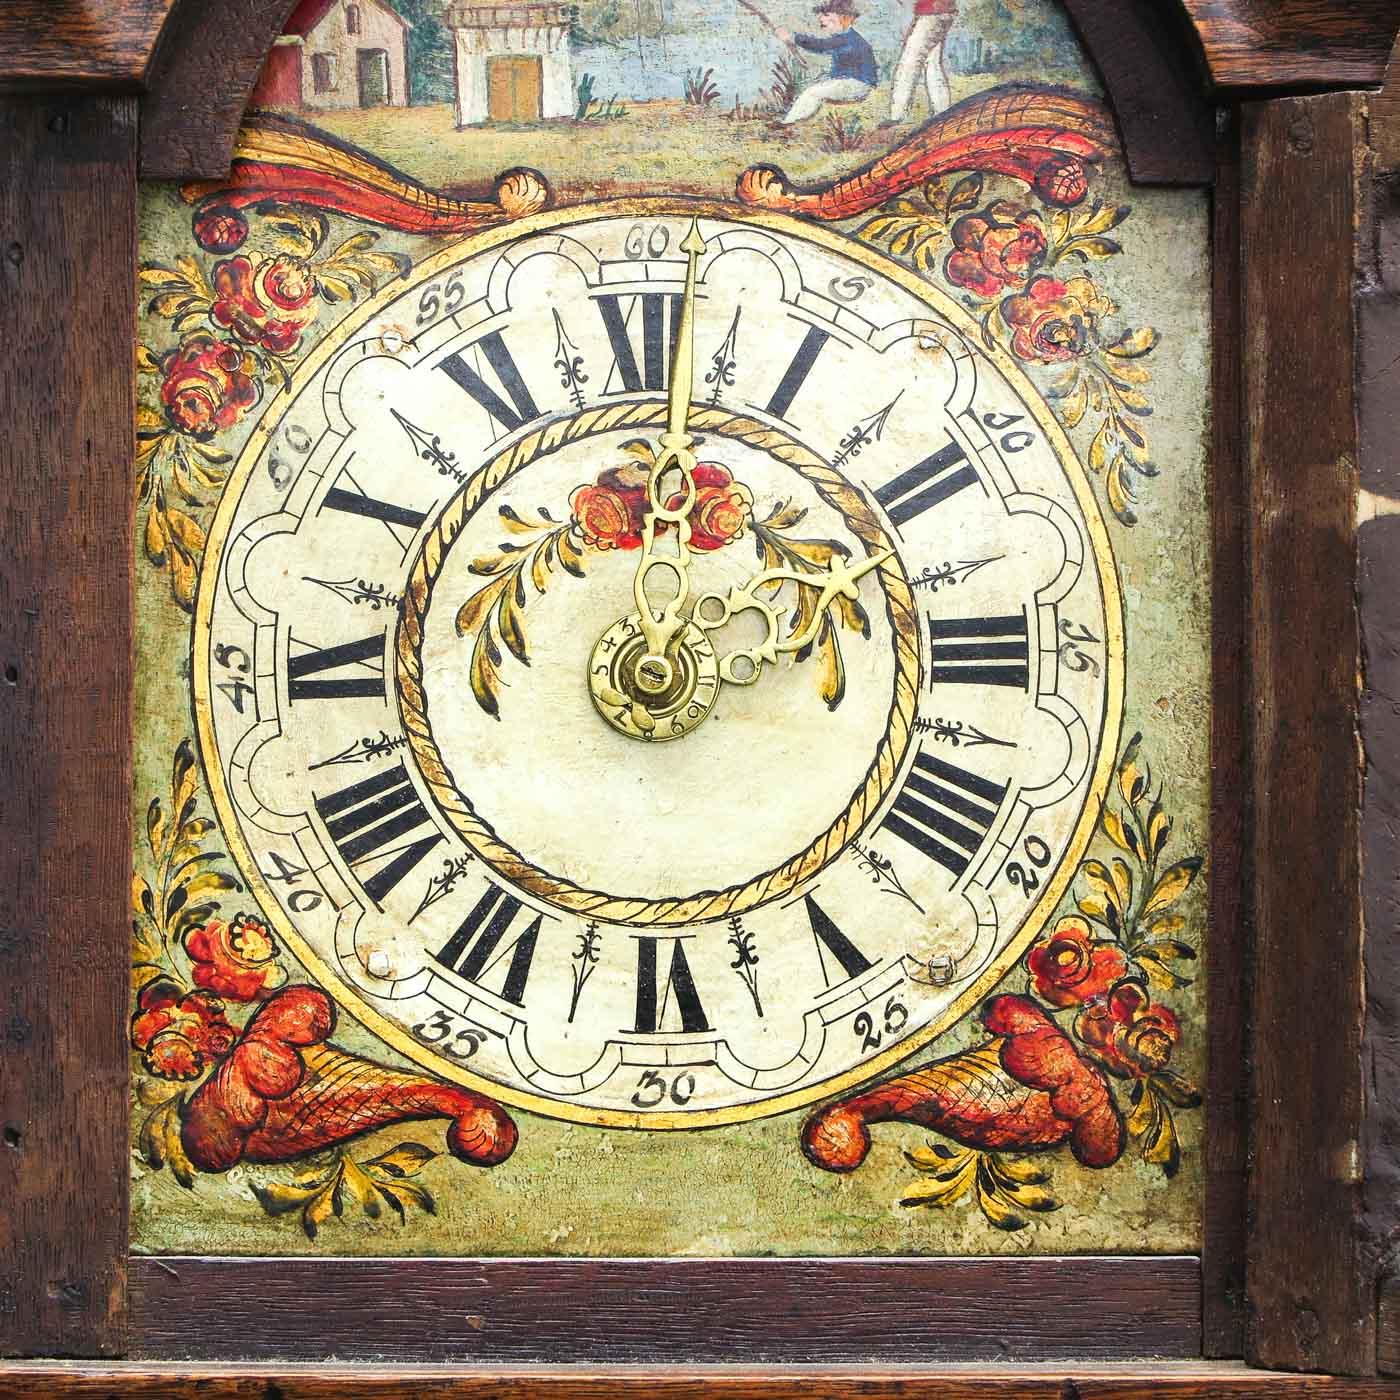 Lot 1035 - A 19th Century Friesland Clock